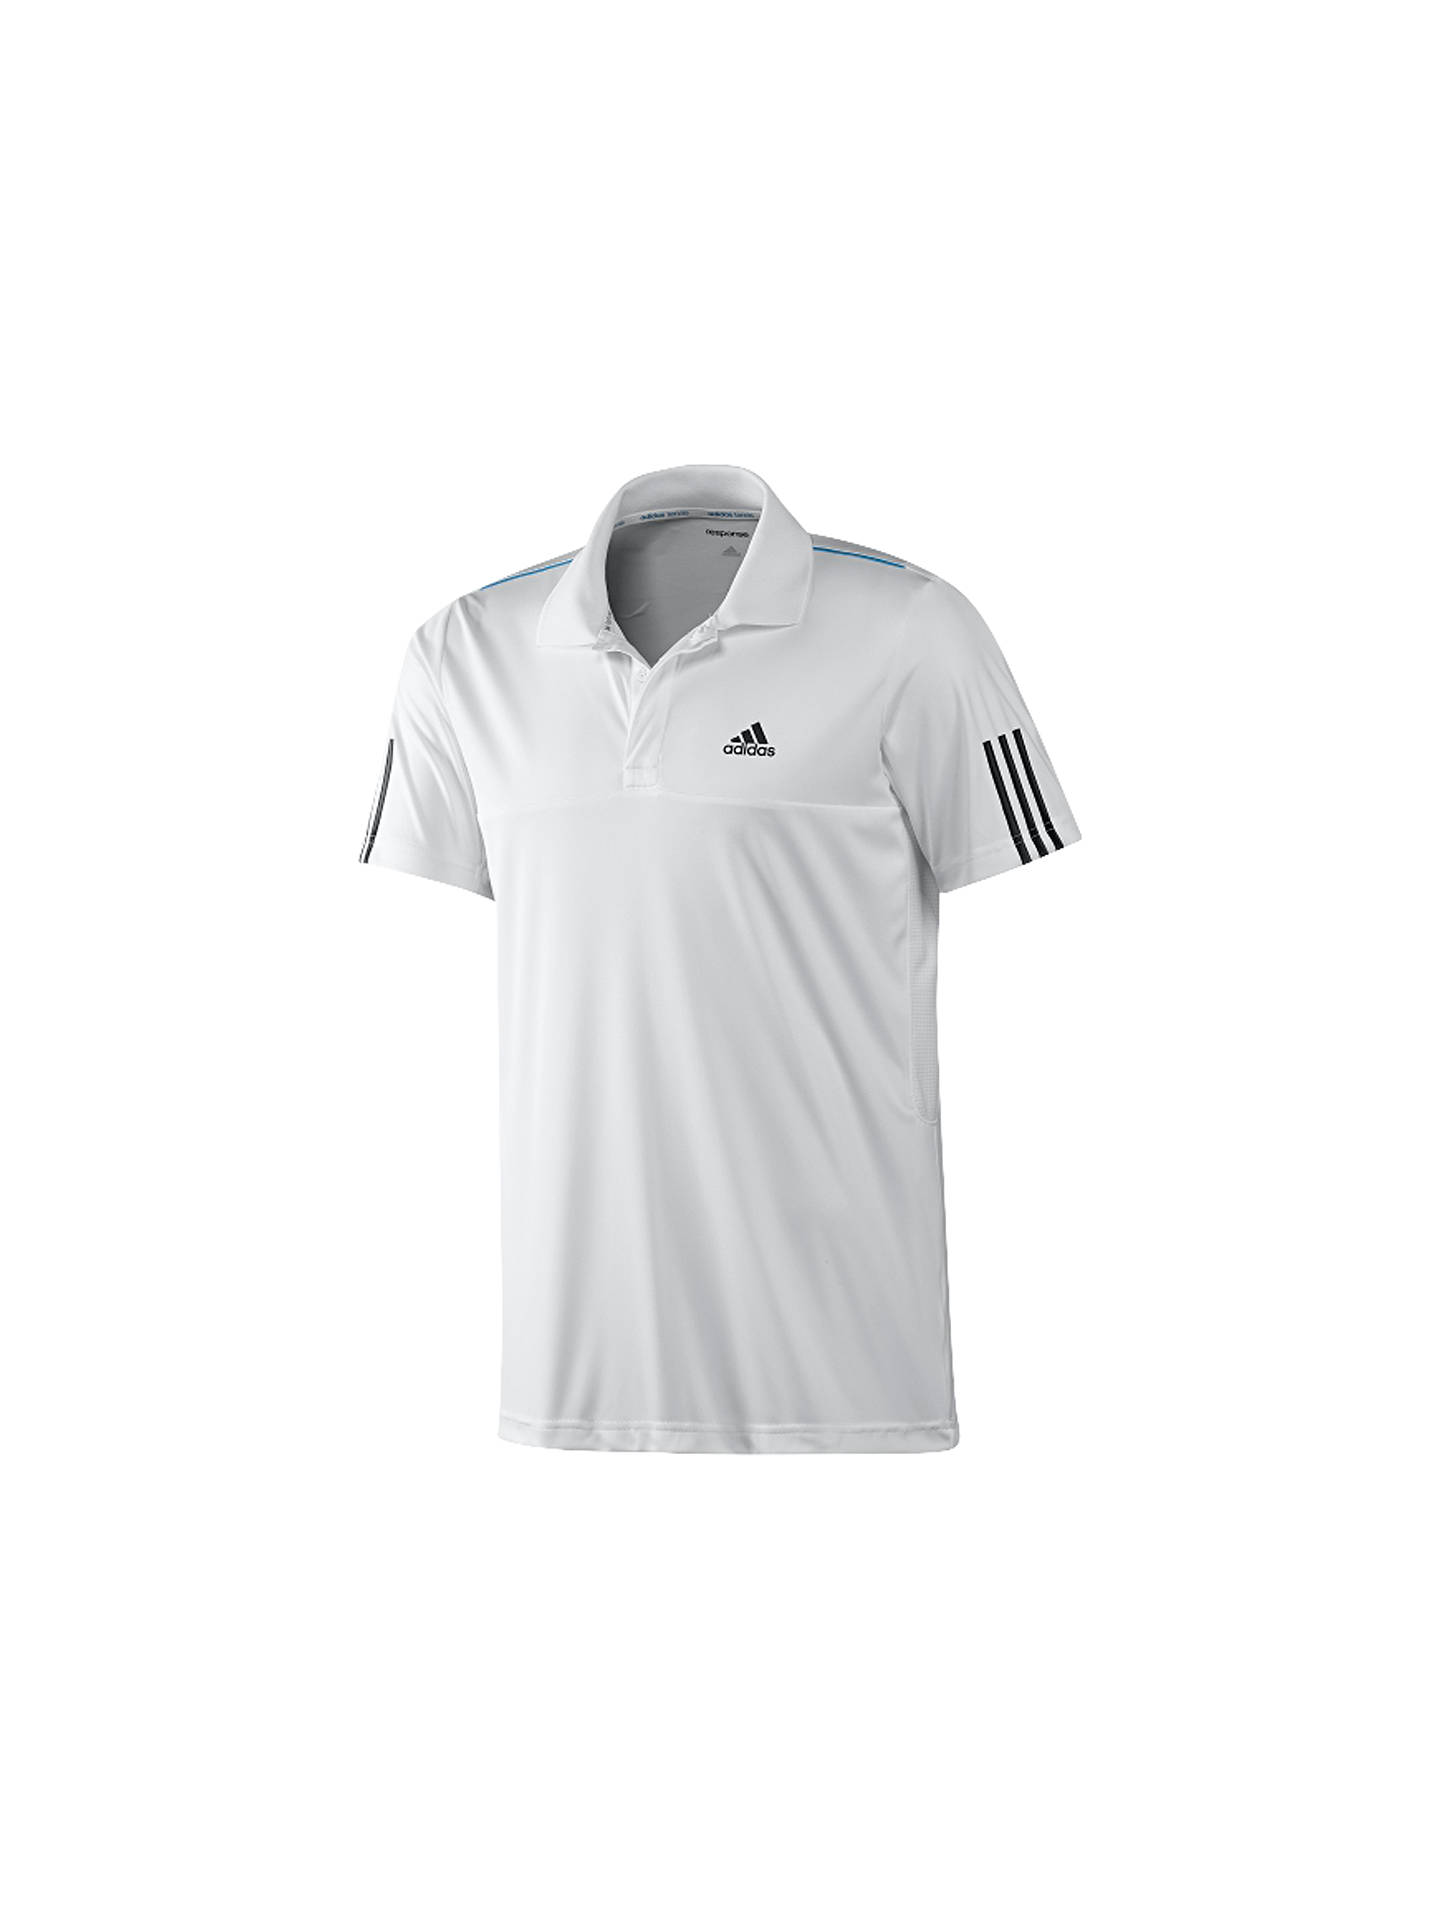 0e80c44e BuyAdidas Tennis Response Polo Shirt, White, XS Online at johnlewis.com ...